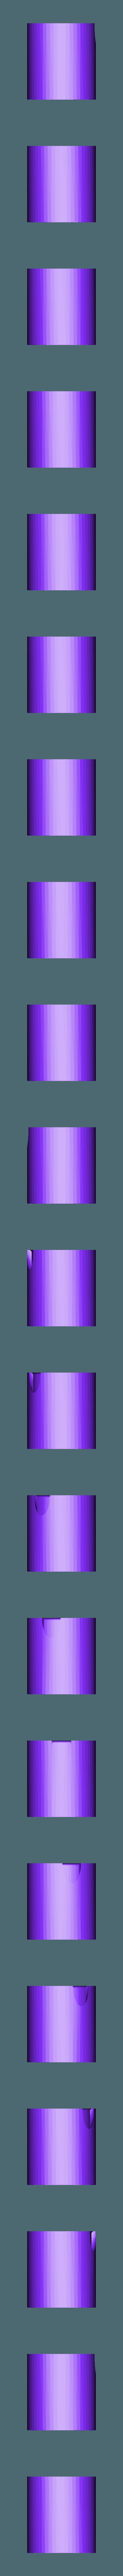 cendrier piece v2.STL Download free STL file Portable ashtray • 3D printer model, Lys